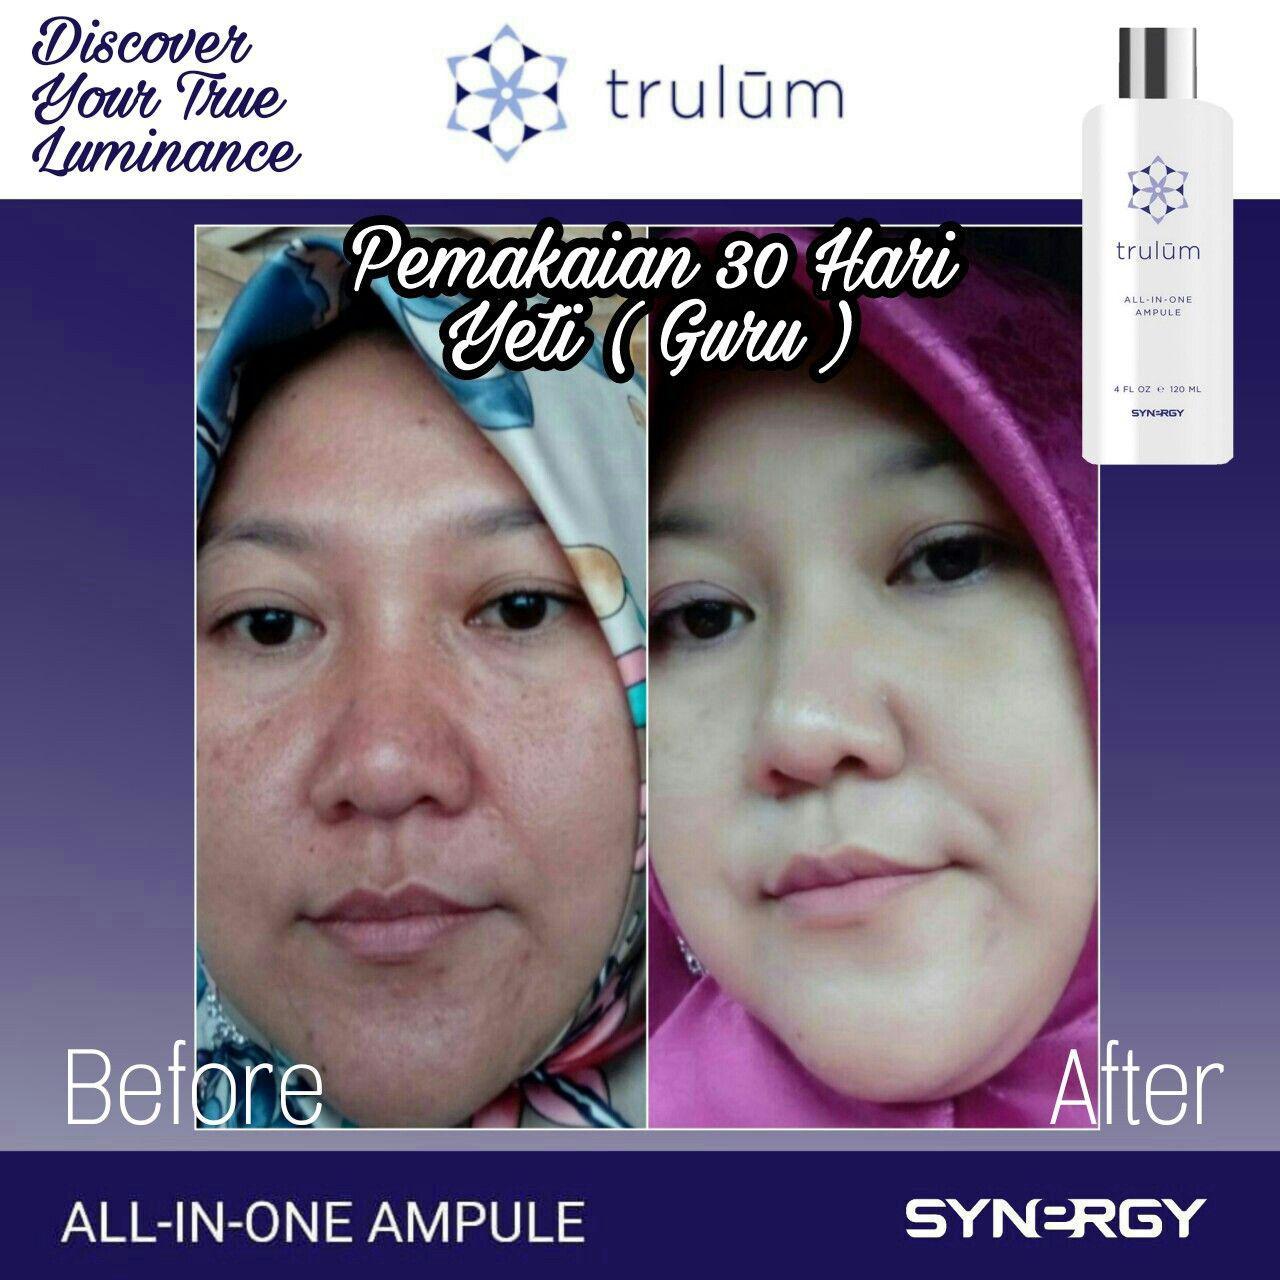 Klinik Kecantikan Trulum Di Biru, Bandung WA: 08112338376